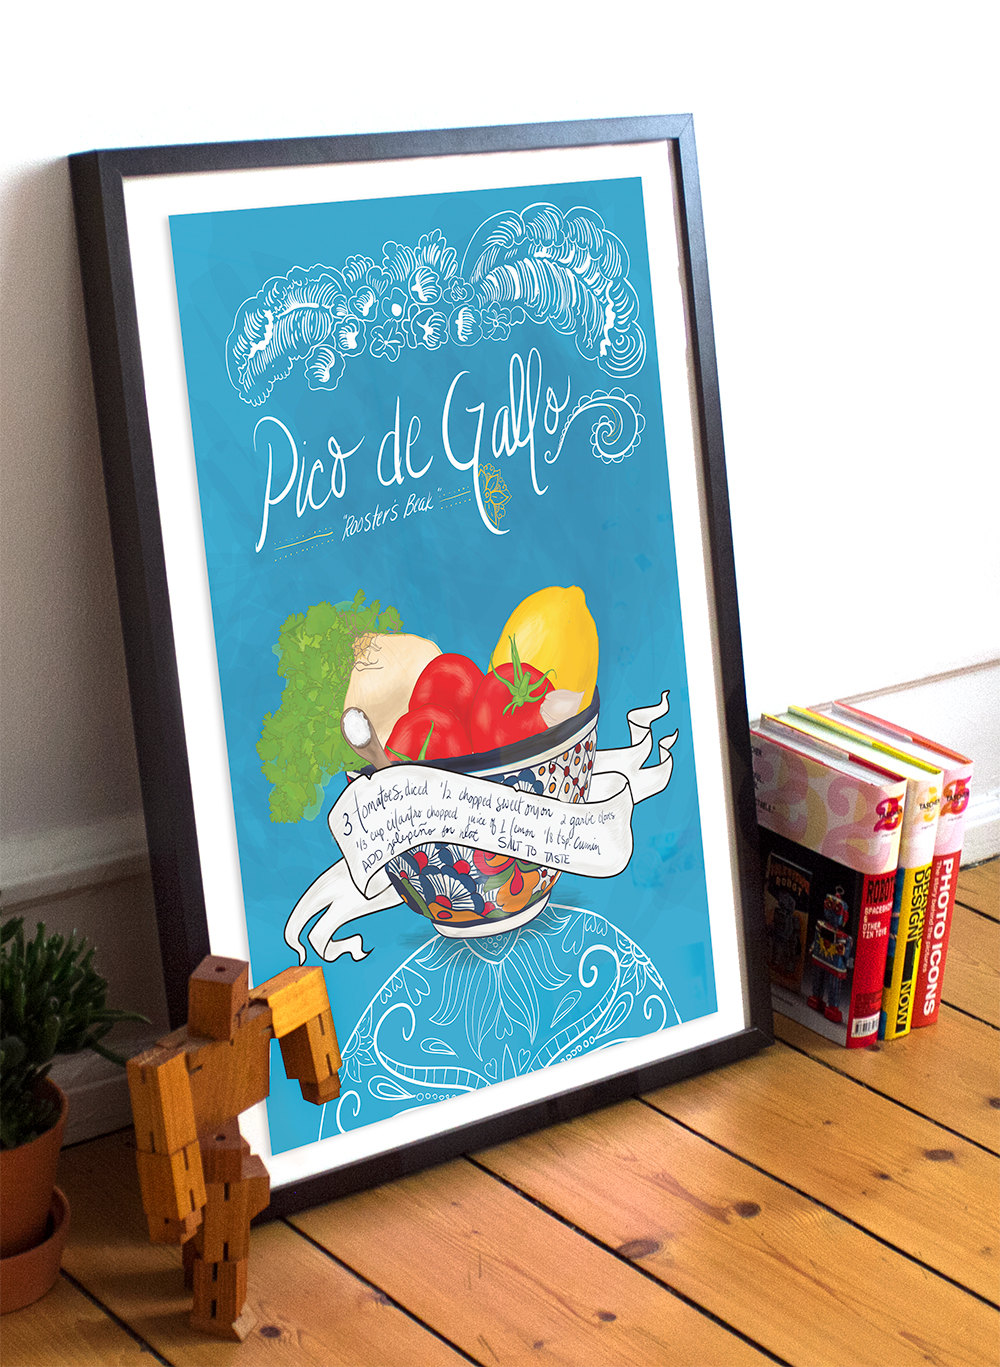 Pico De Gallo Recipe Mexican Kitchen Print Illustrated Dia De Los Muertos  Salsa Recipe Giclee Cotton